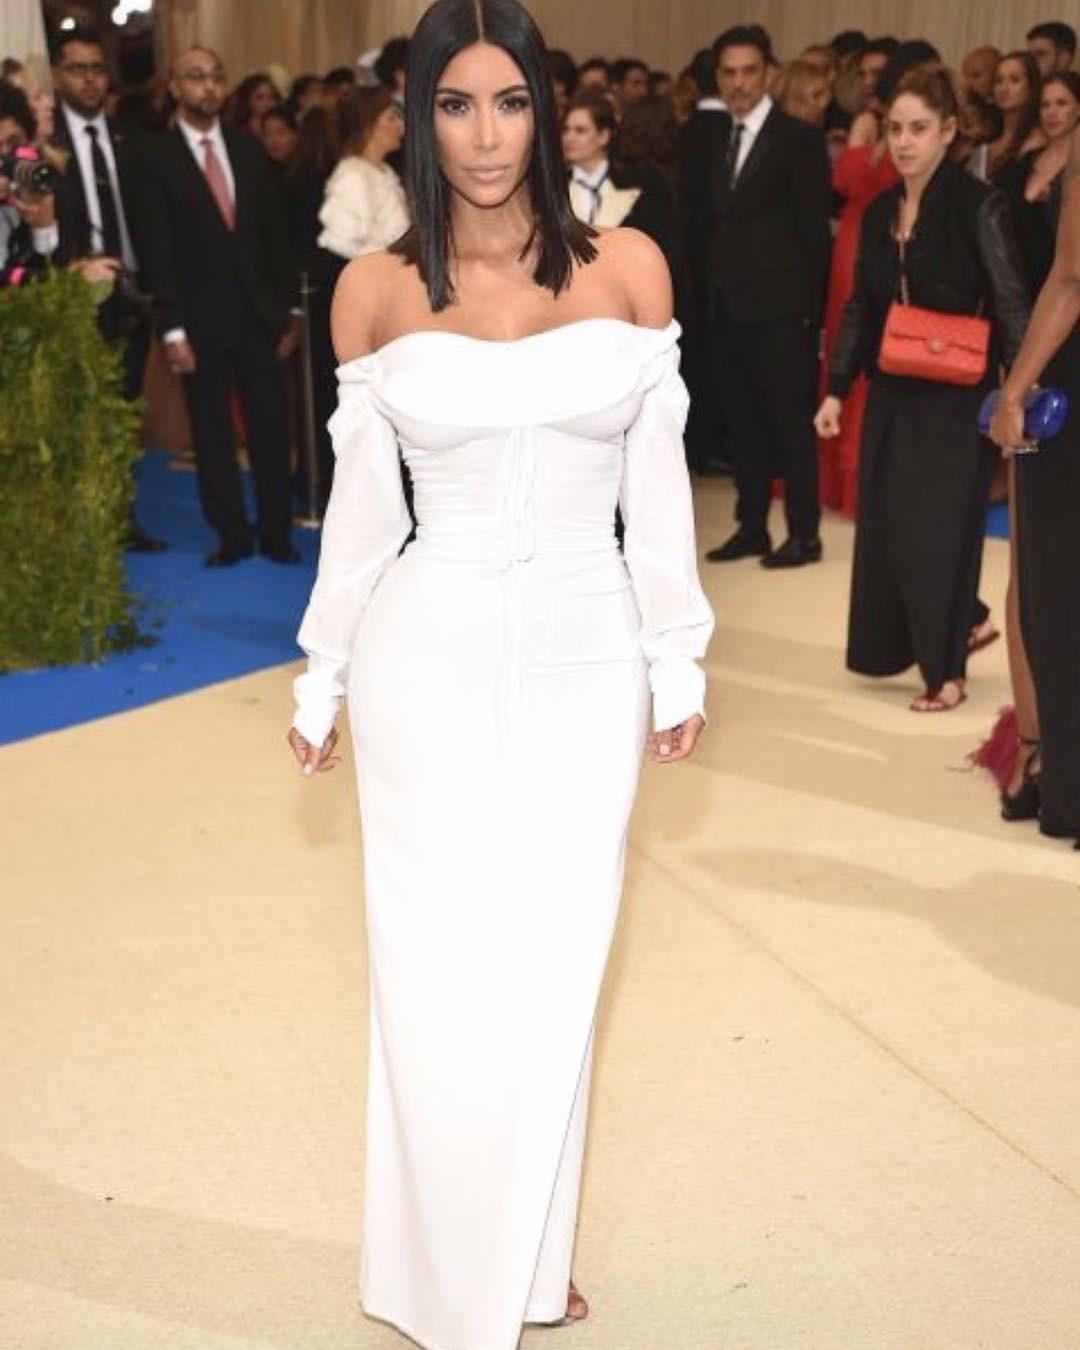 Kim Kadarshian memakai gaun saat menghadiri acara formal. (sumber foto: @kimkadarshian/instagram)